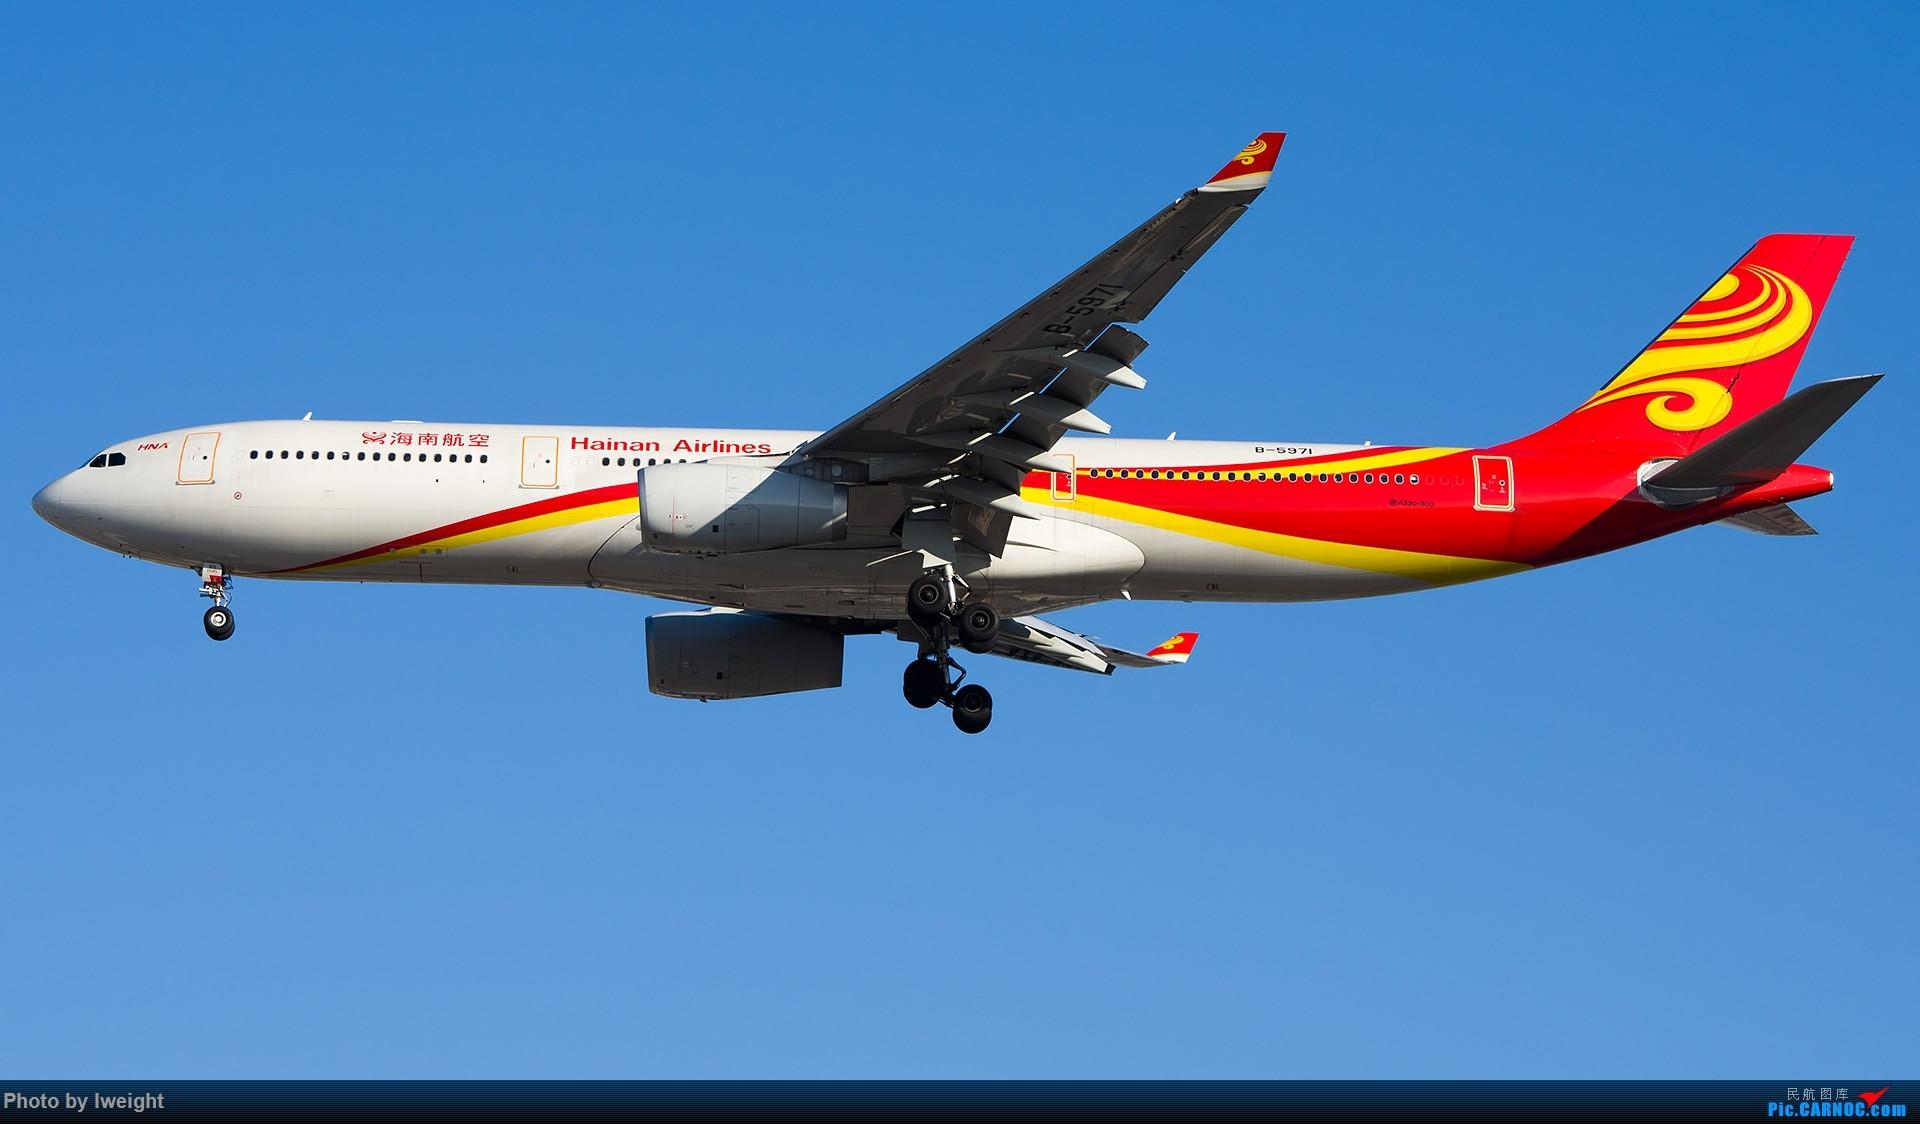 Re:[原创]终于在12月的北京等到了一个晴天的周末,出来拍拍飞机【2015-12-5】 AIRBUS A330-300 B-5971 中国北京首都国际机场